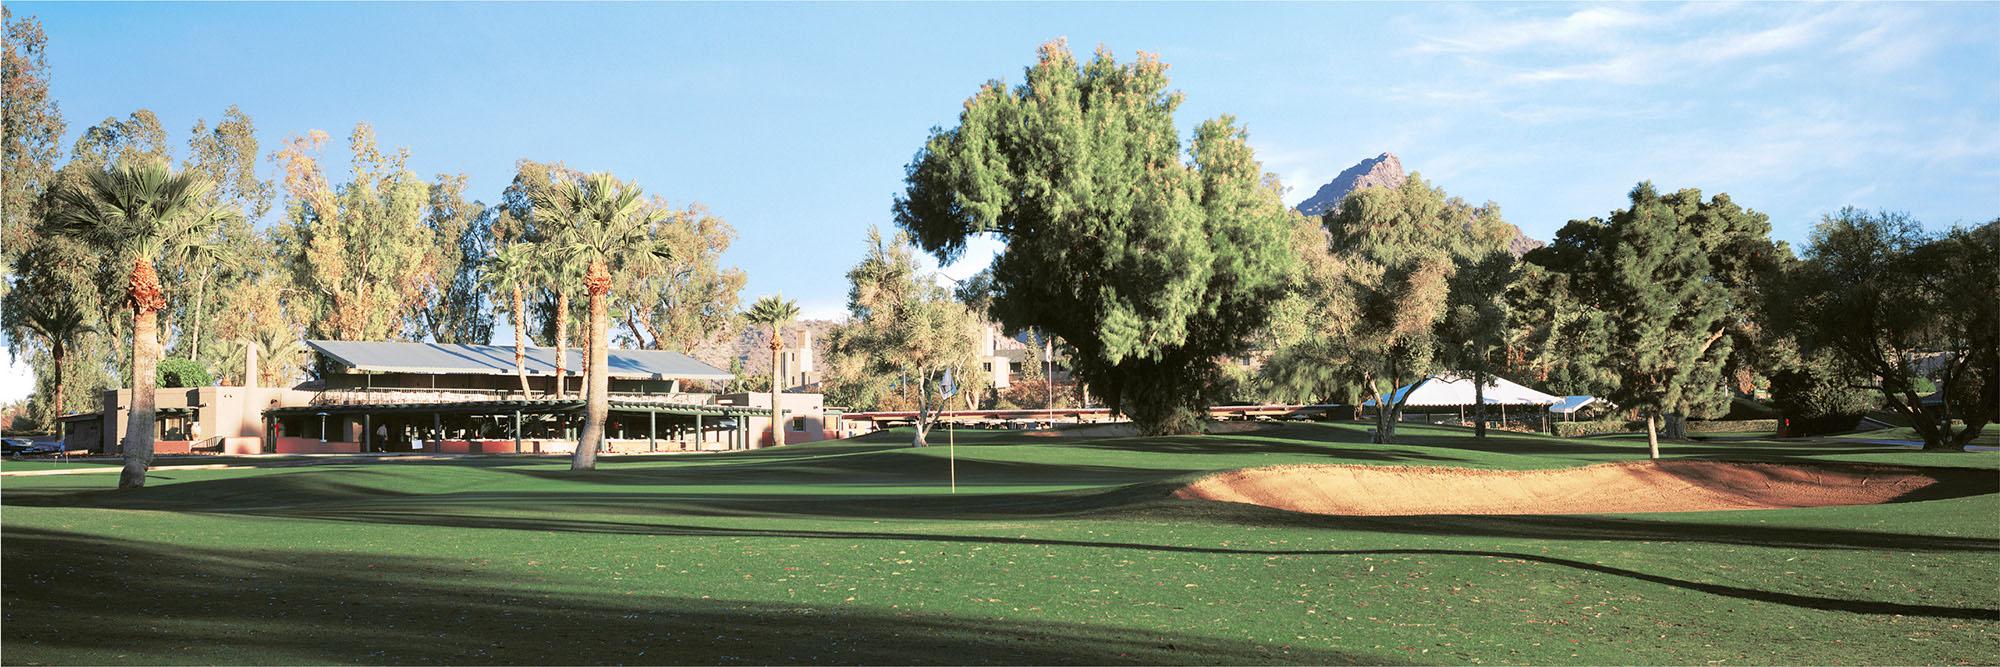 Golf Course Image - Arizona Biltmore No. 4